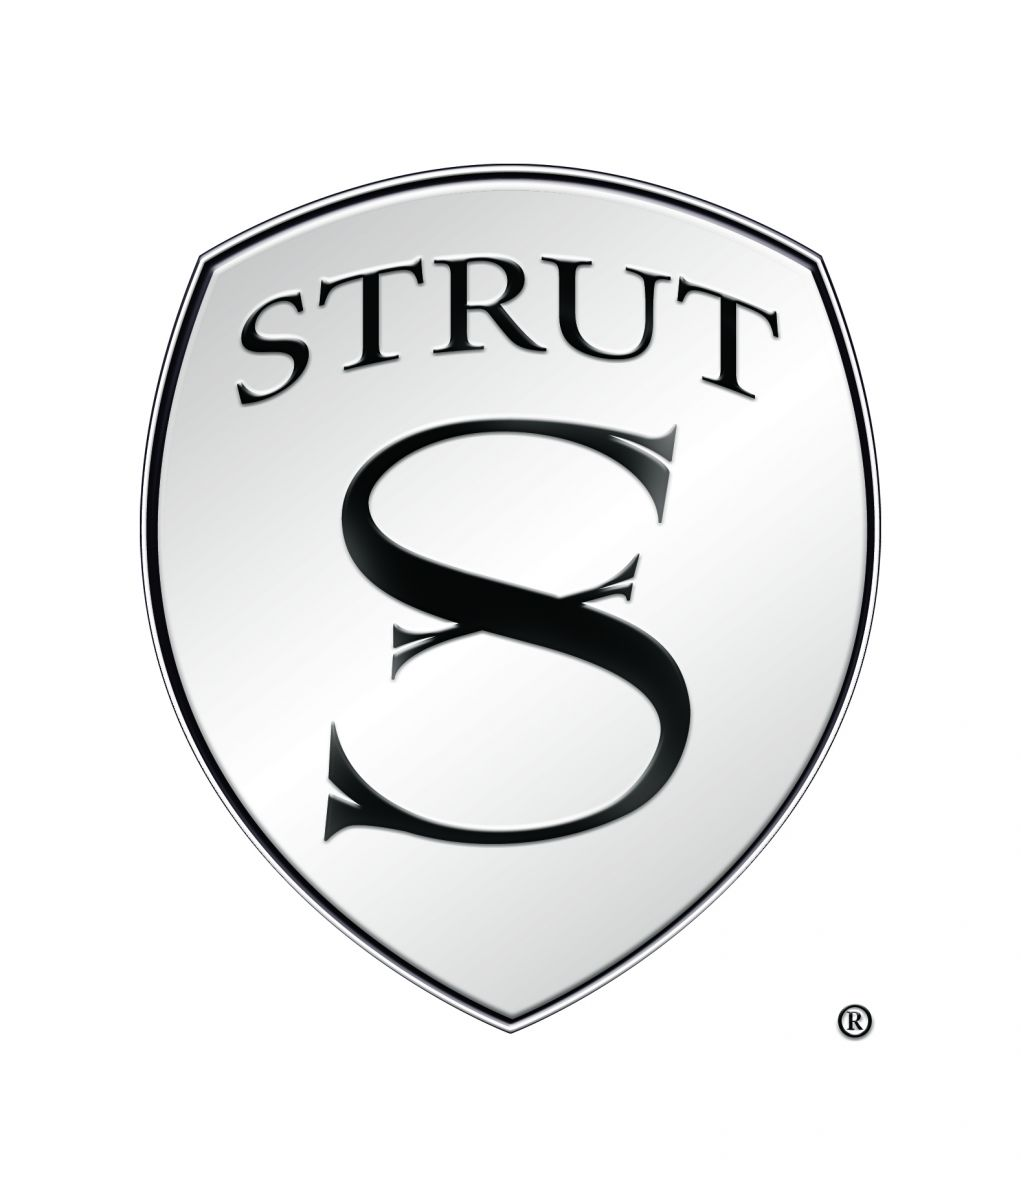 strut_metalcmykW